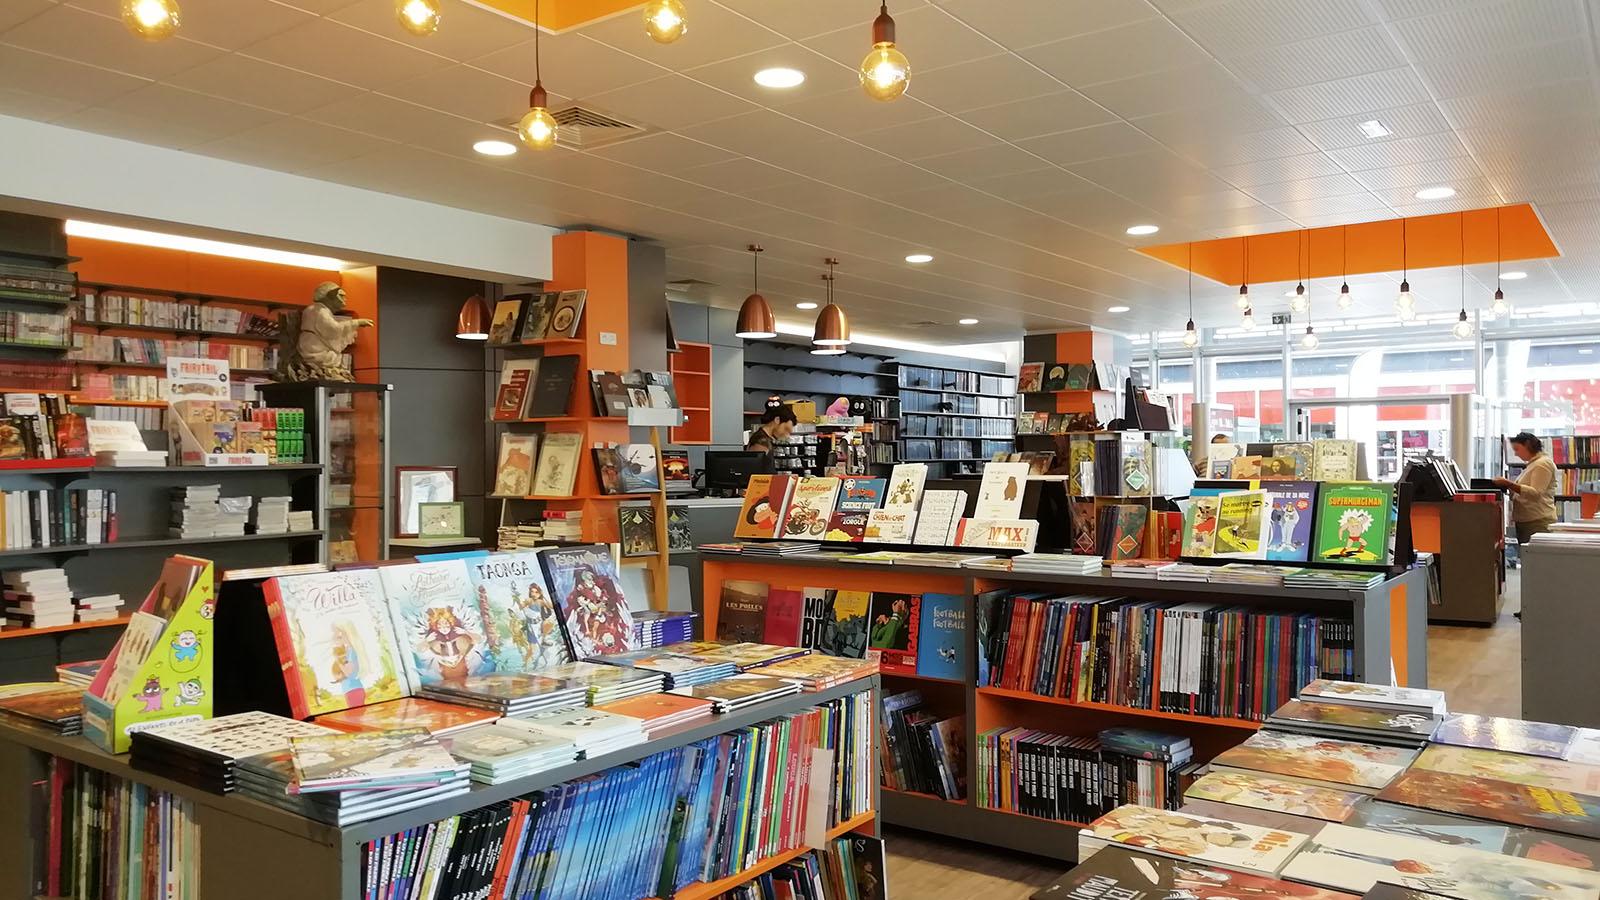 EFI Design EFI Design Librairie La Roche Sur Yon (21) 1379